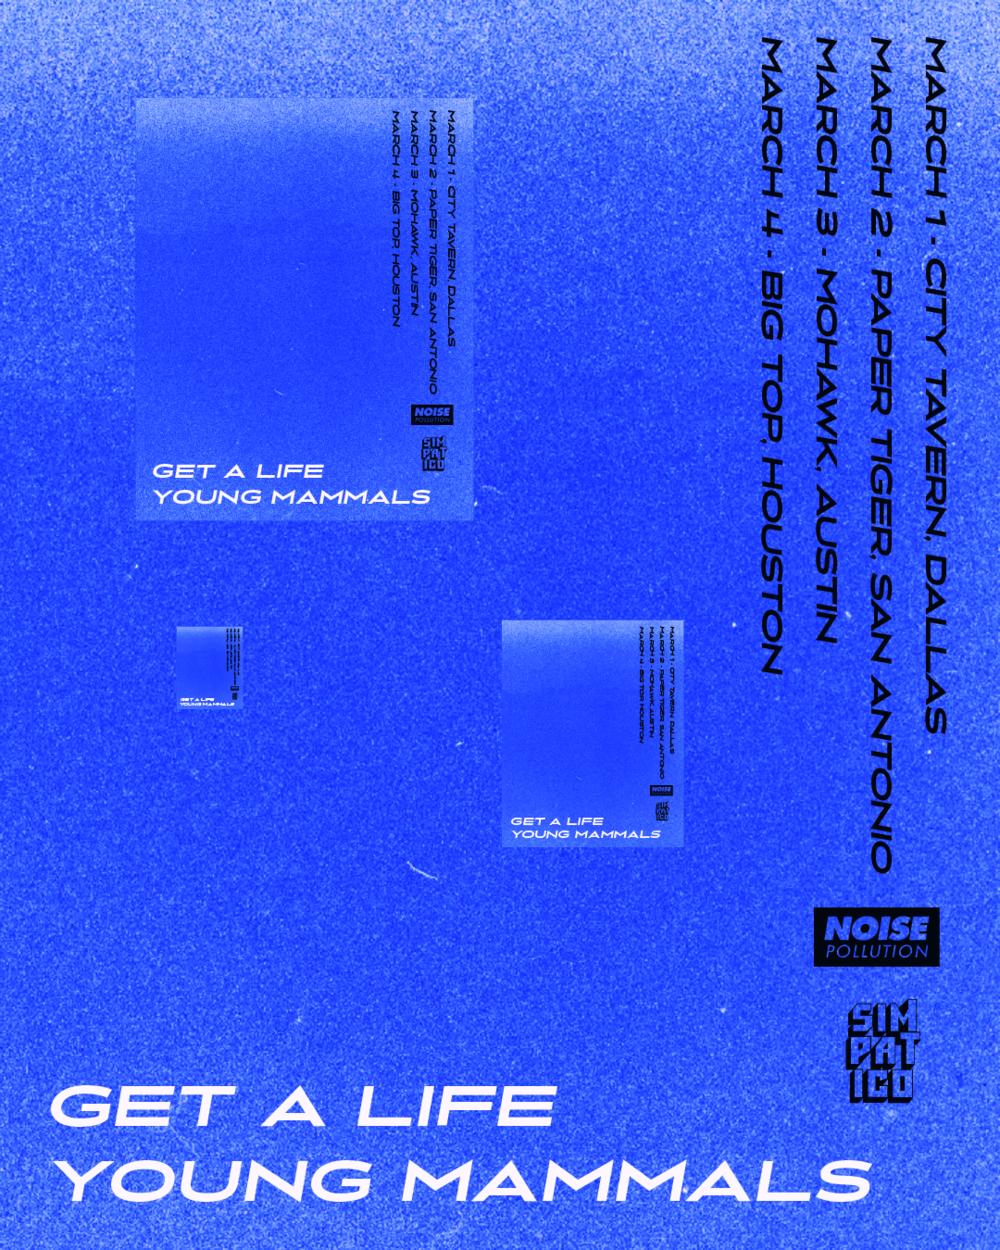 Get a Life/ Young Mammals Tour Flyer